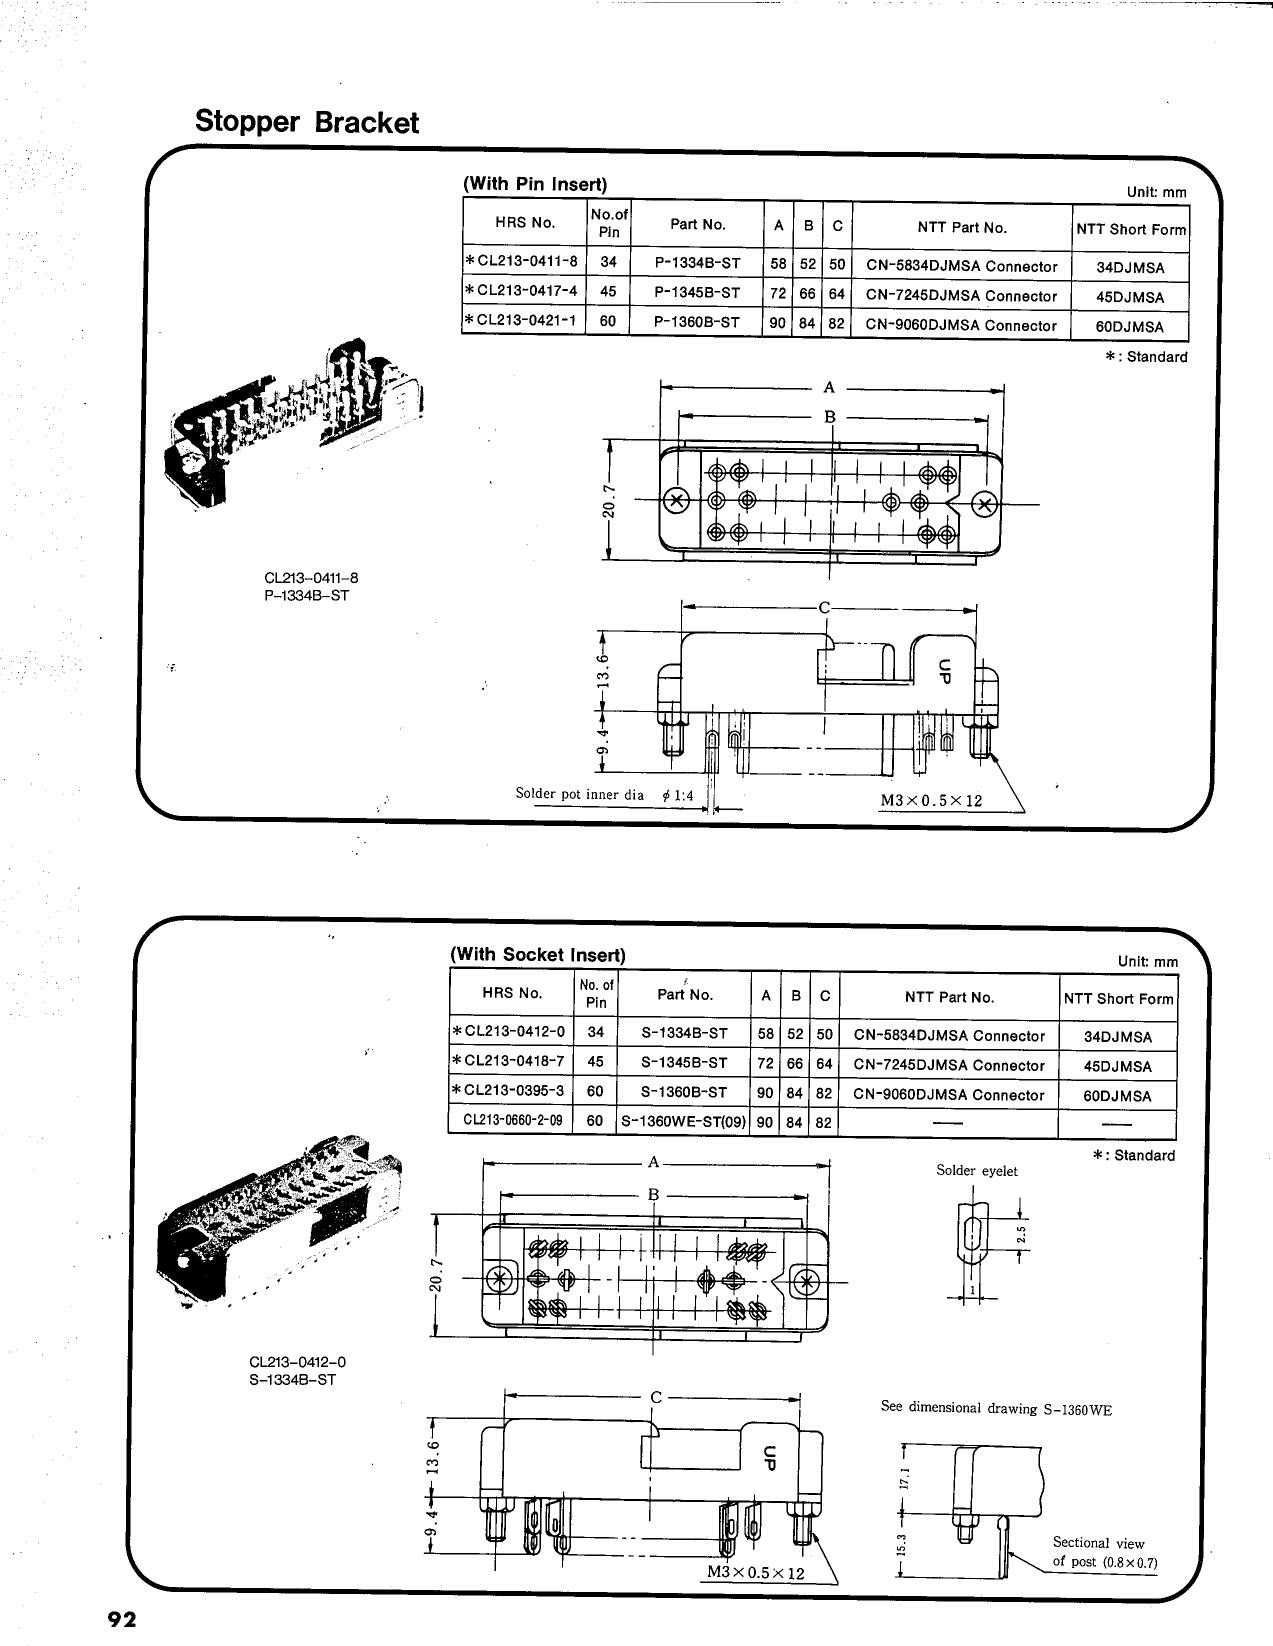 P-1316-CT arduino